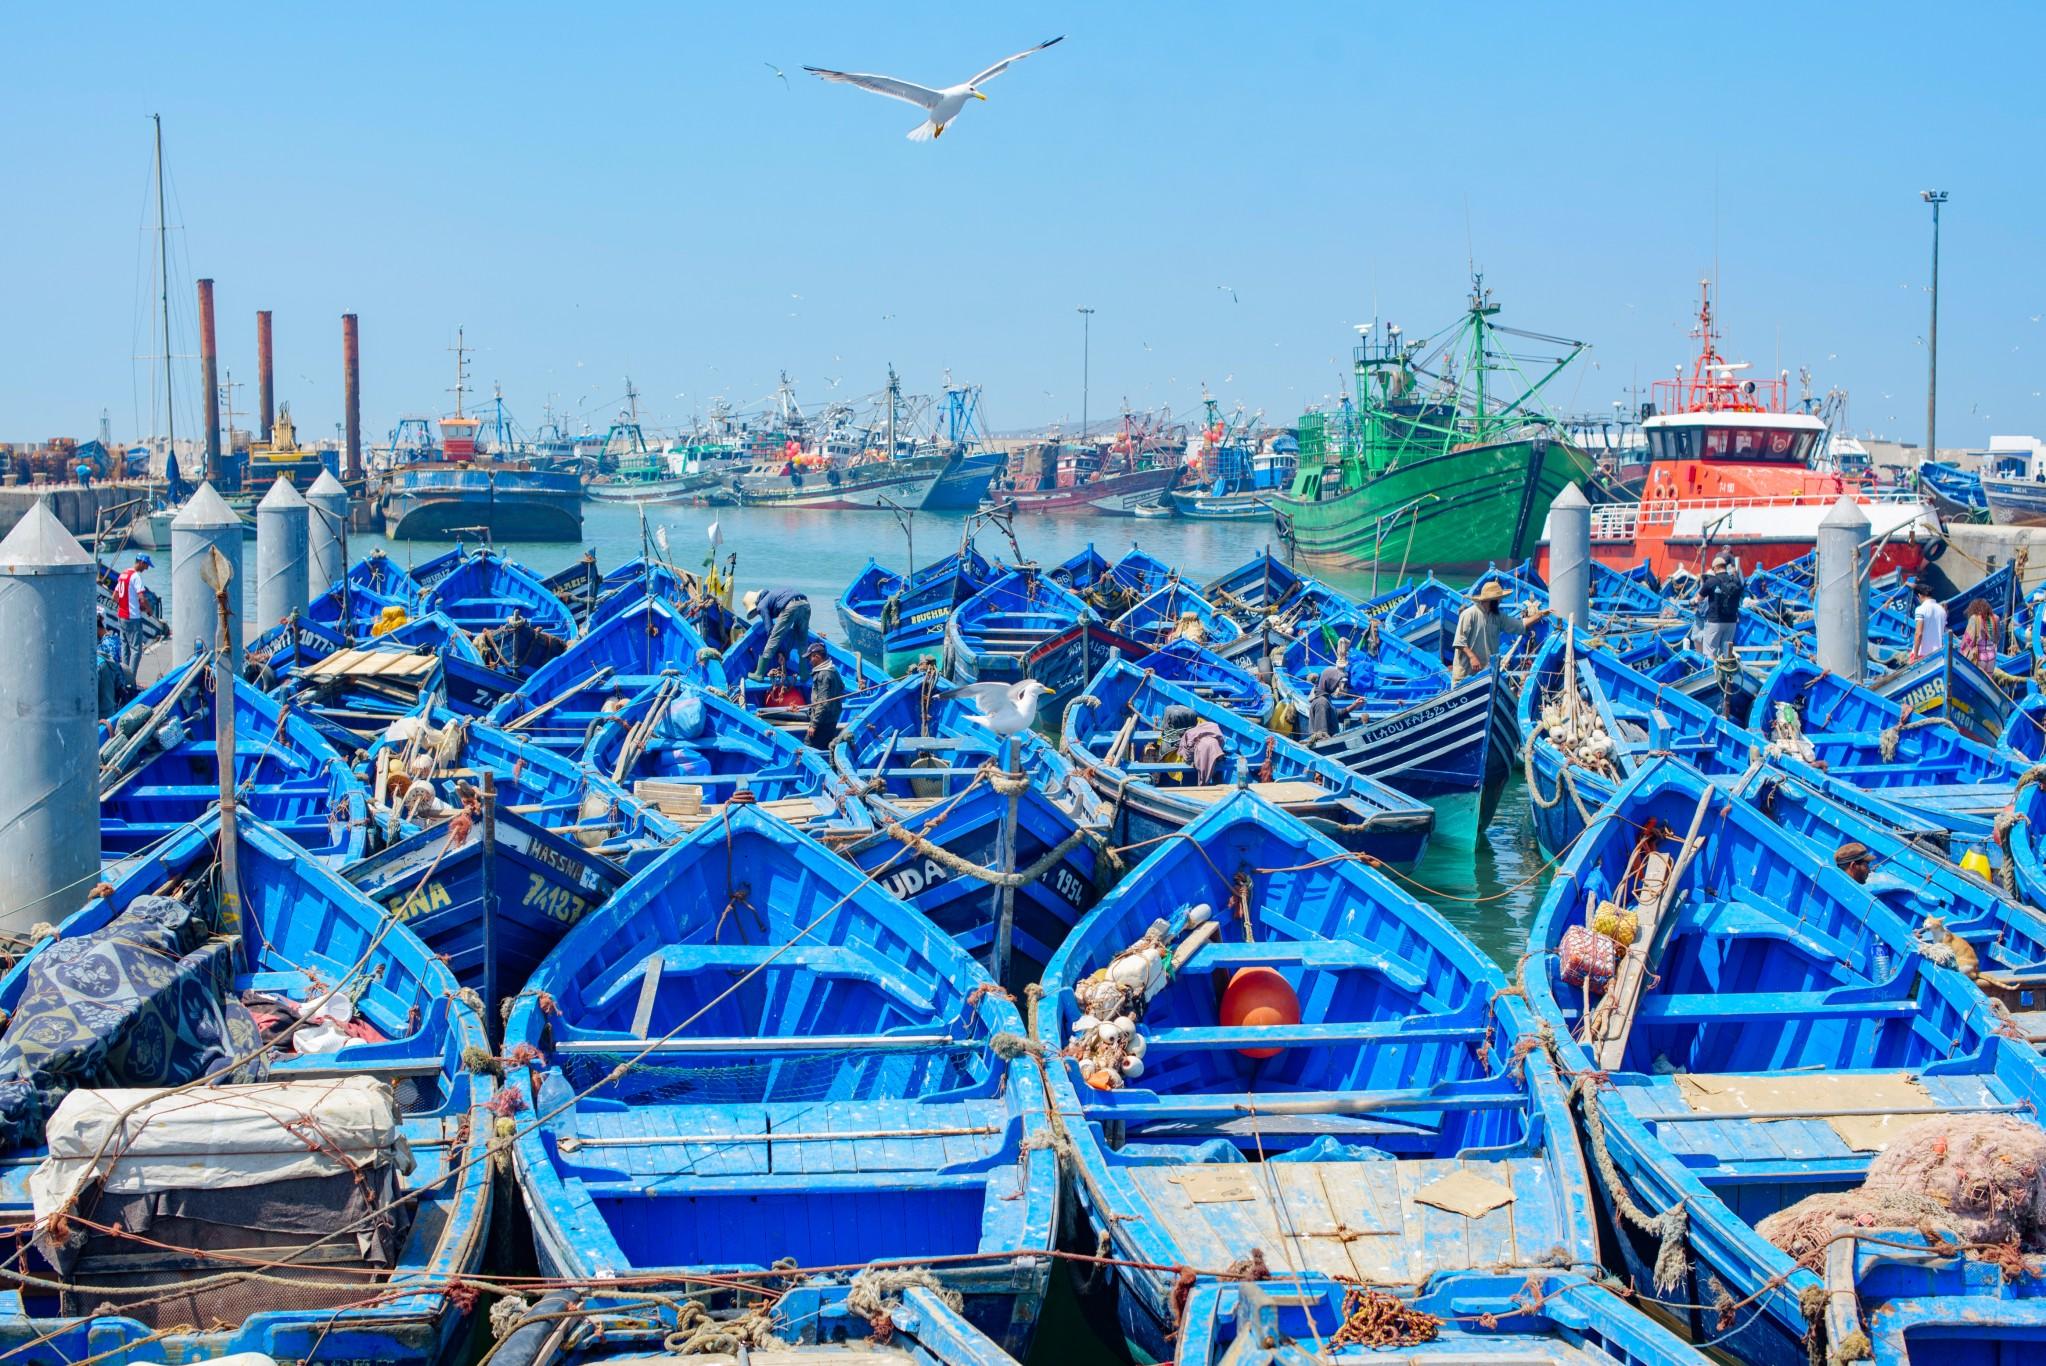 Marruecos, tesoro monumental, herencia cultural